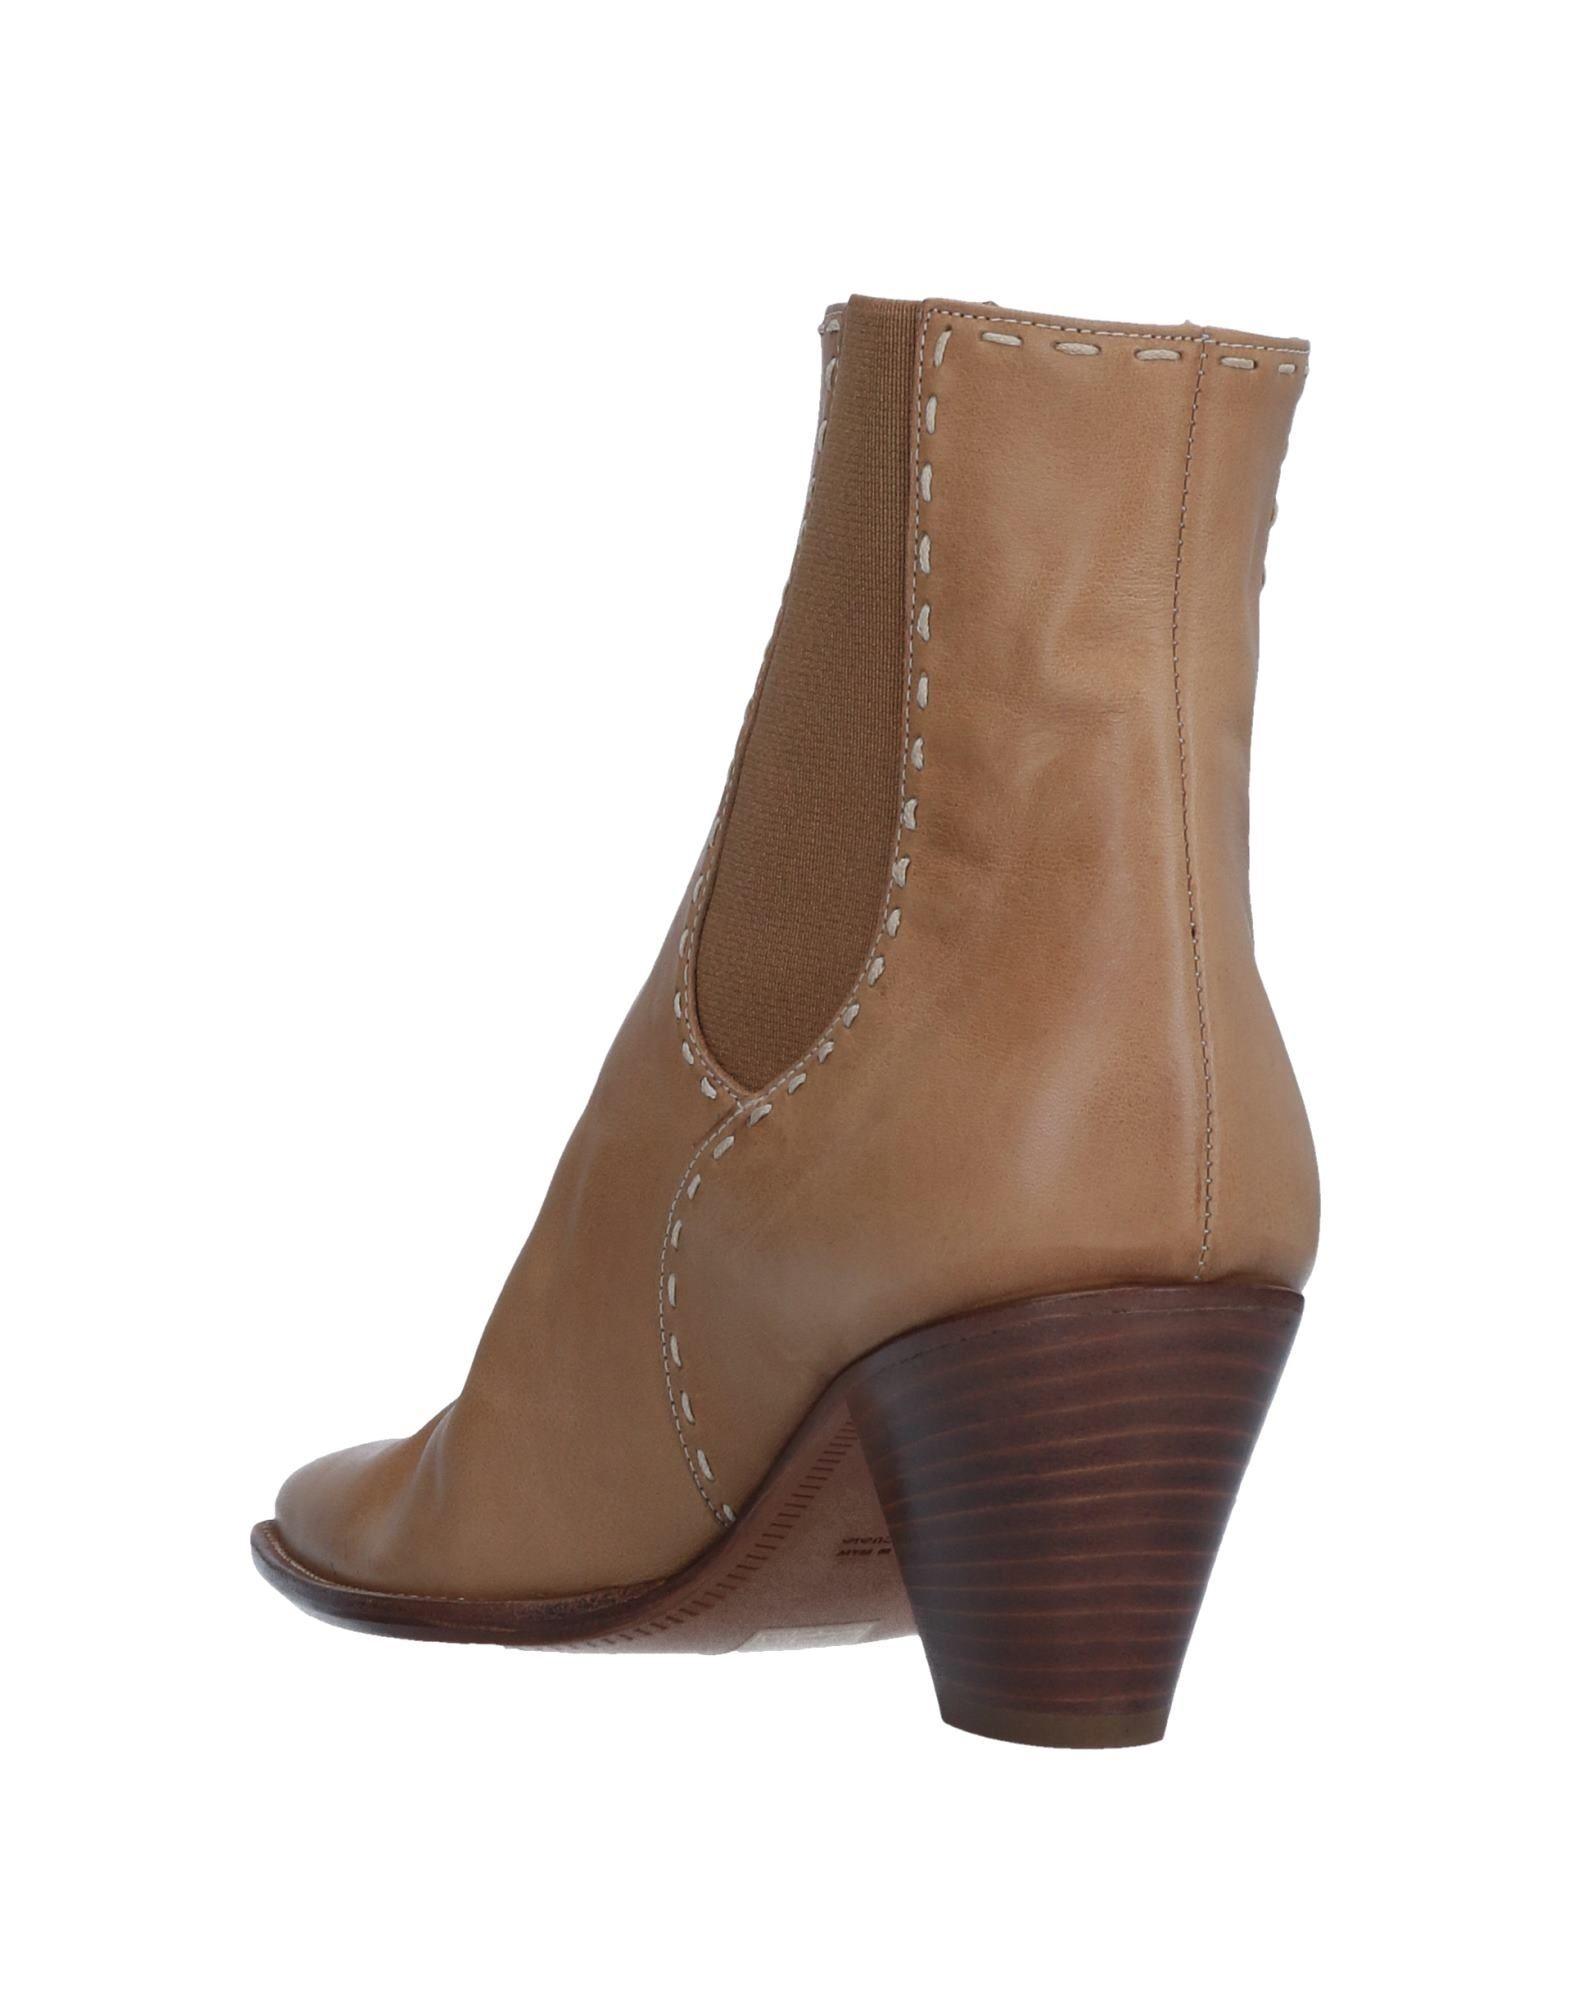 Duccio Damen Del Duca Chelsea Boots Damen Duccio  11525772JIGut aussehende strapazierfähige Schuhe 168859